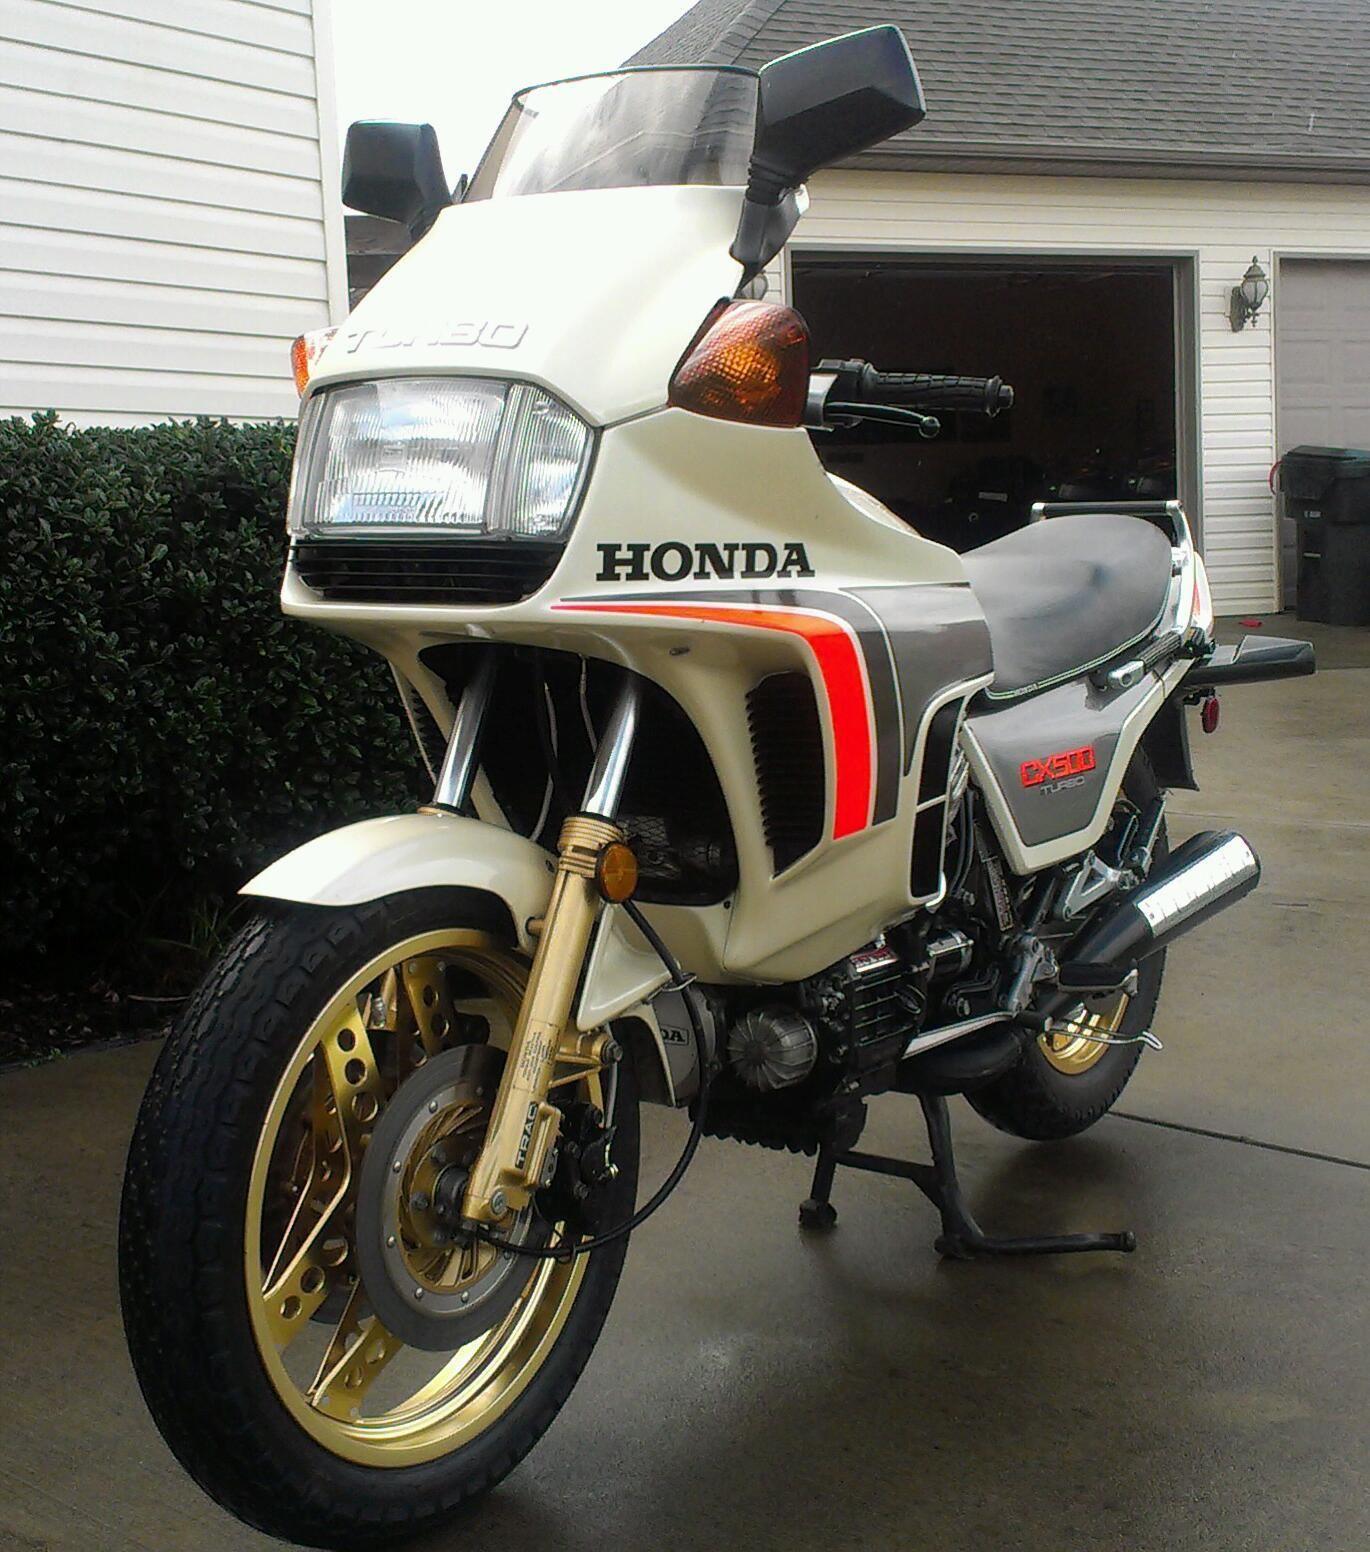 Turbo Bike Pic: 1982 Honda CX500 Turbo